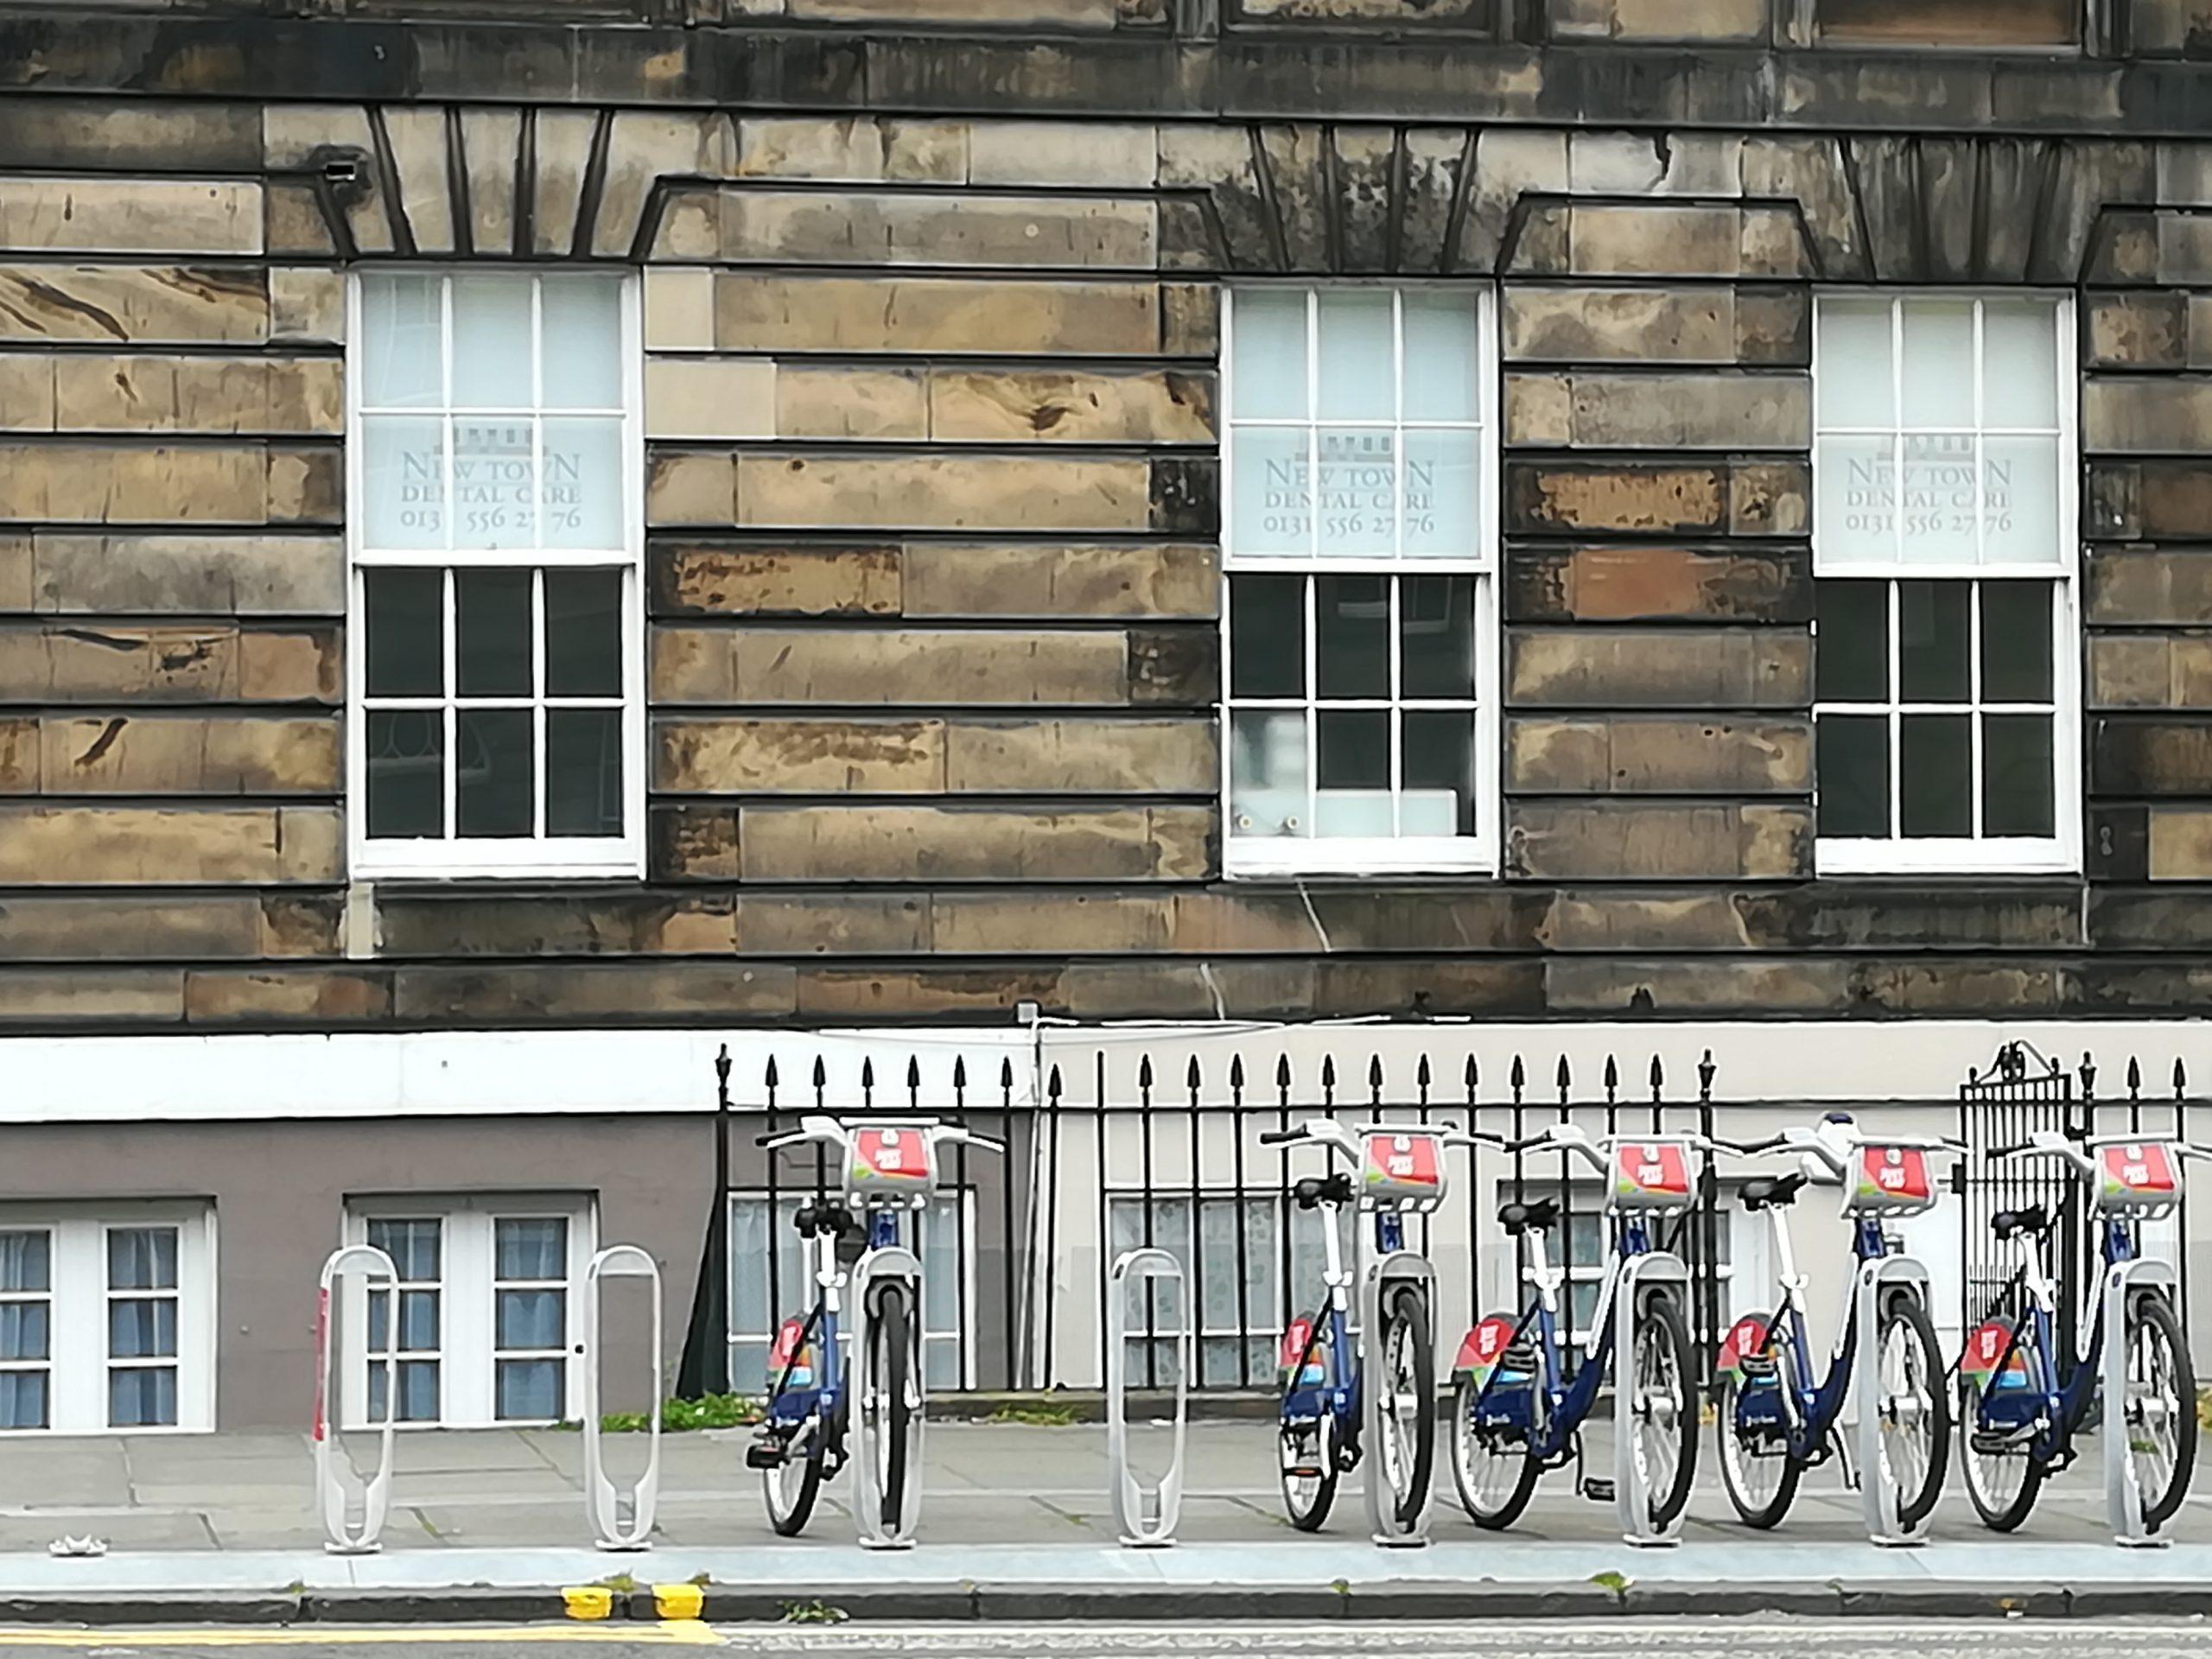 En bici por Edimburgo:¿Pedaleamos?